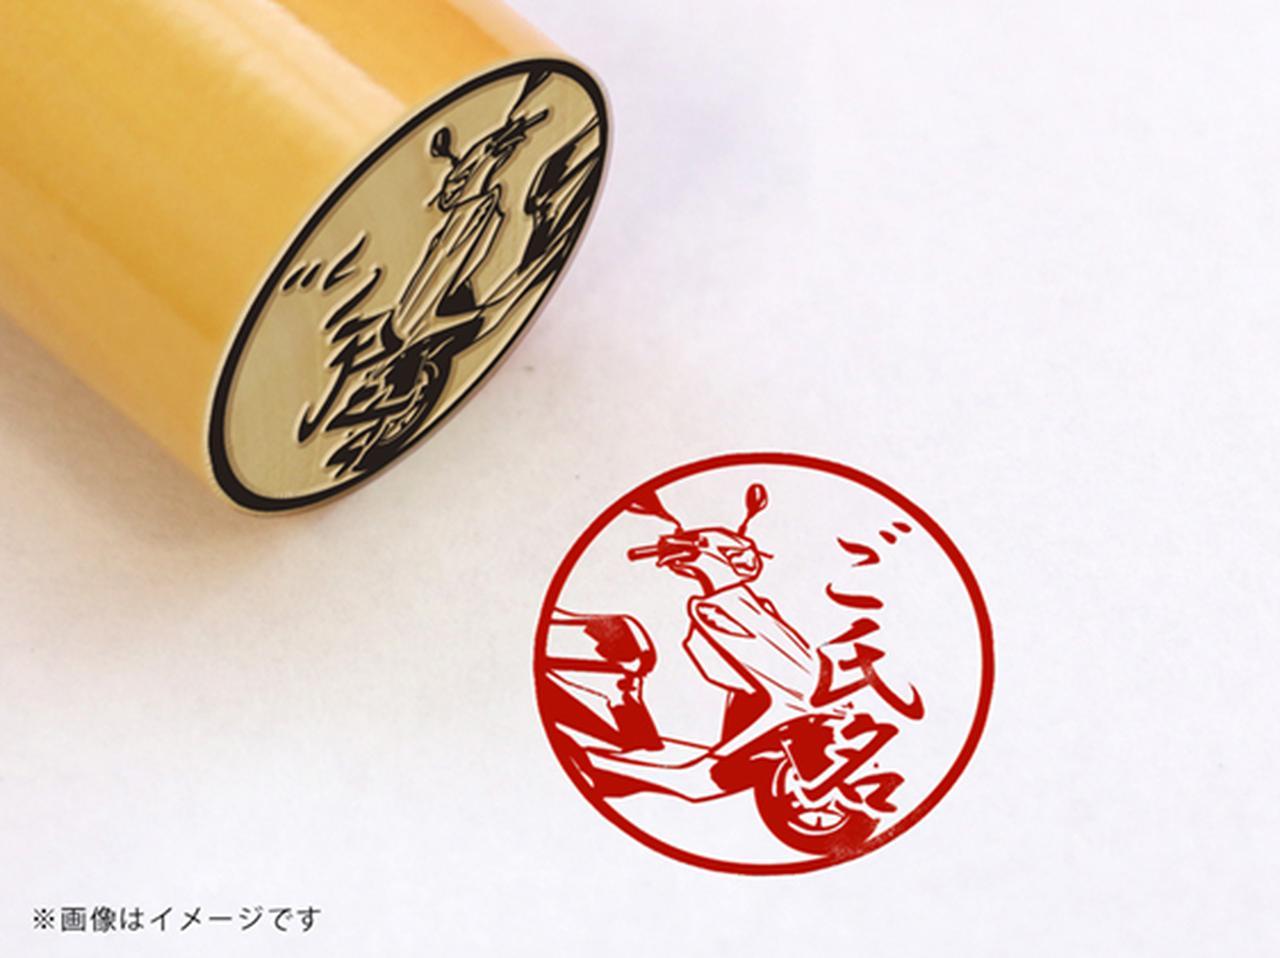 Images : 【SUZUKI】アドレスV125・柘植丸印18mm